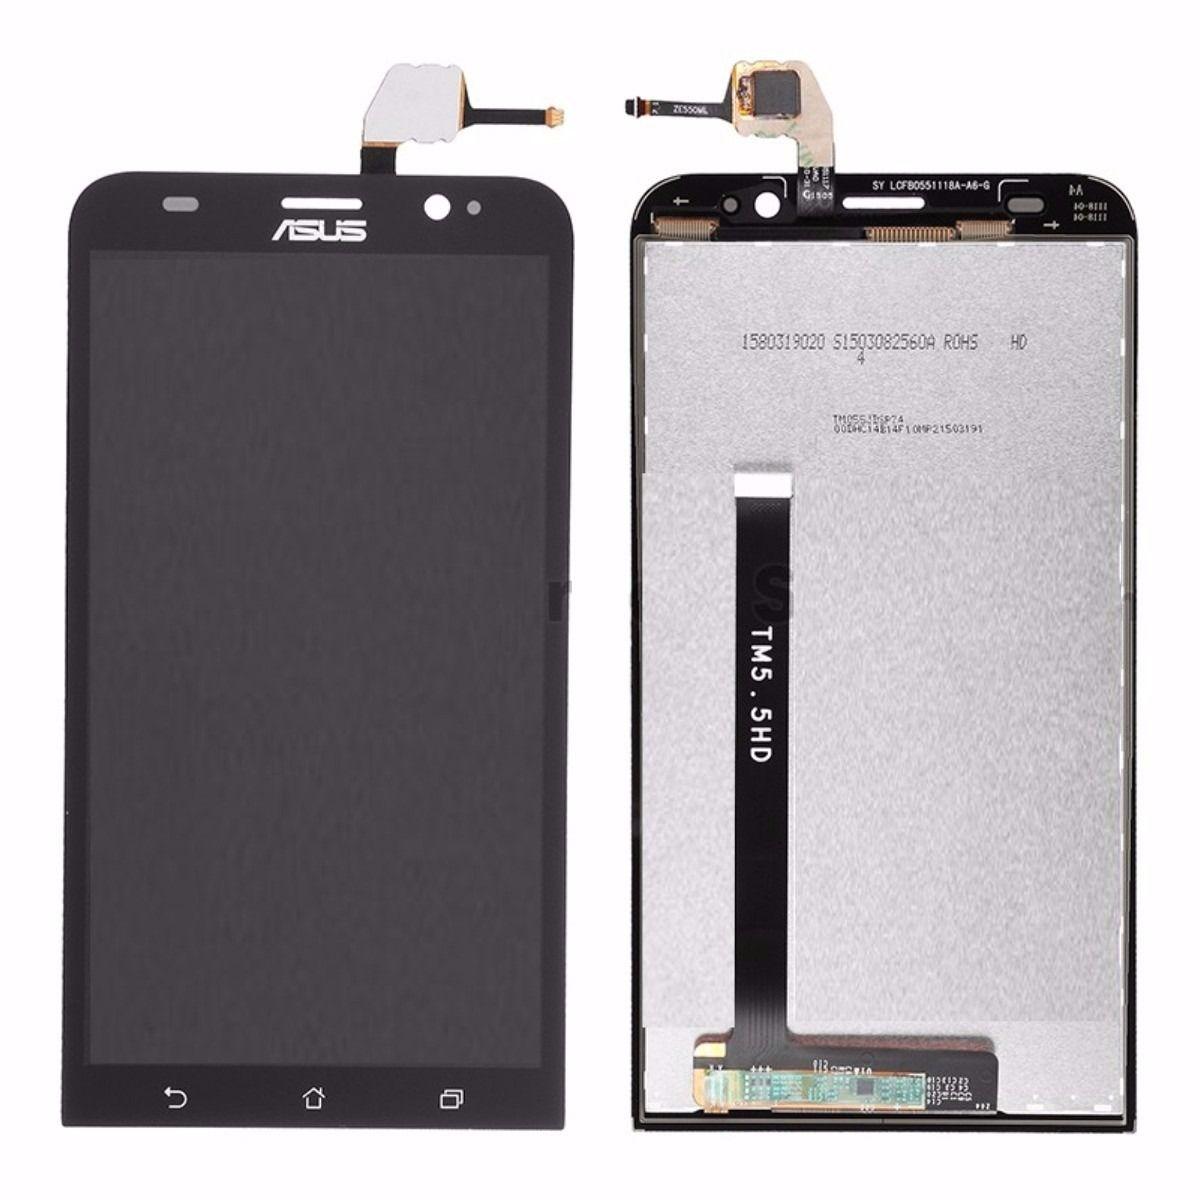 Frontal Display Lcd Tela Touch Asus Zenfone 2 Ze551ml Preto